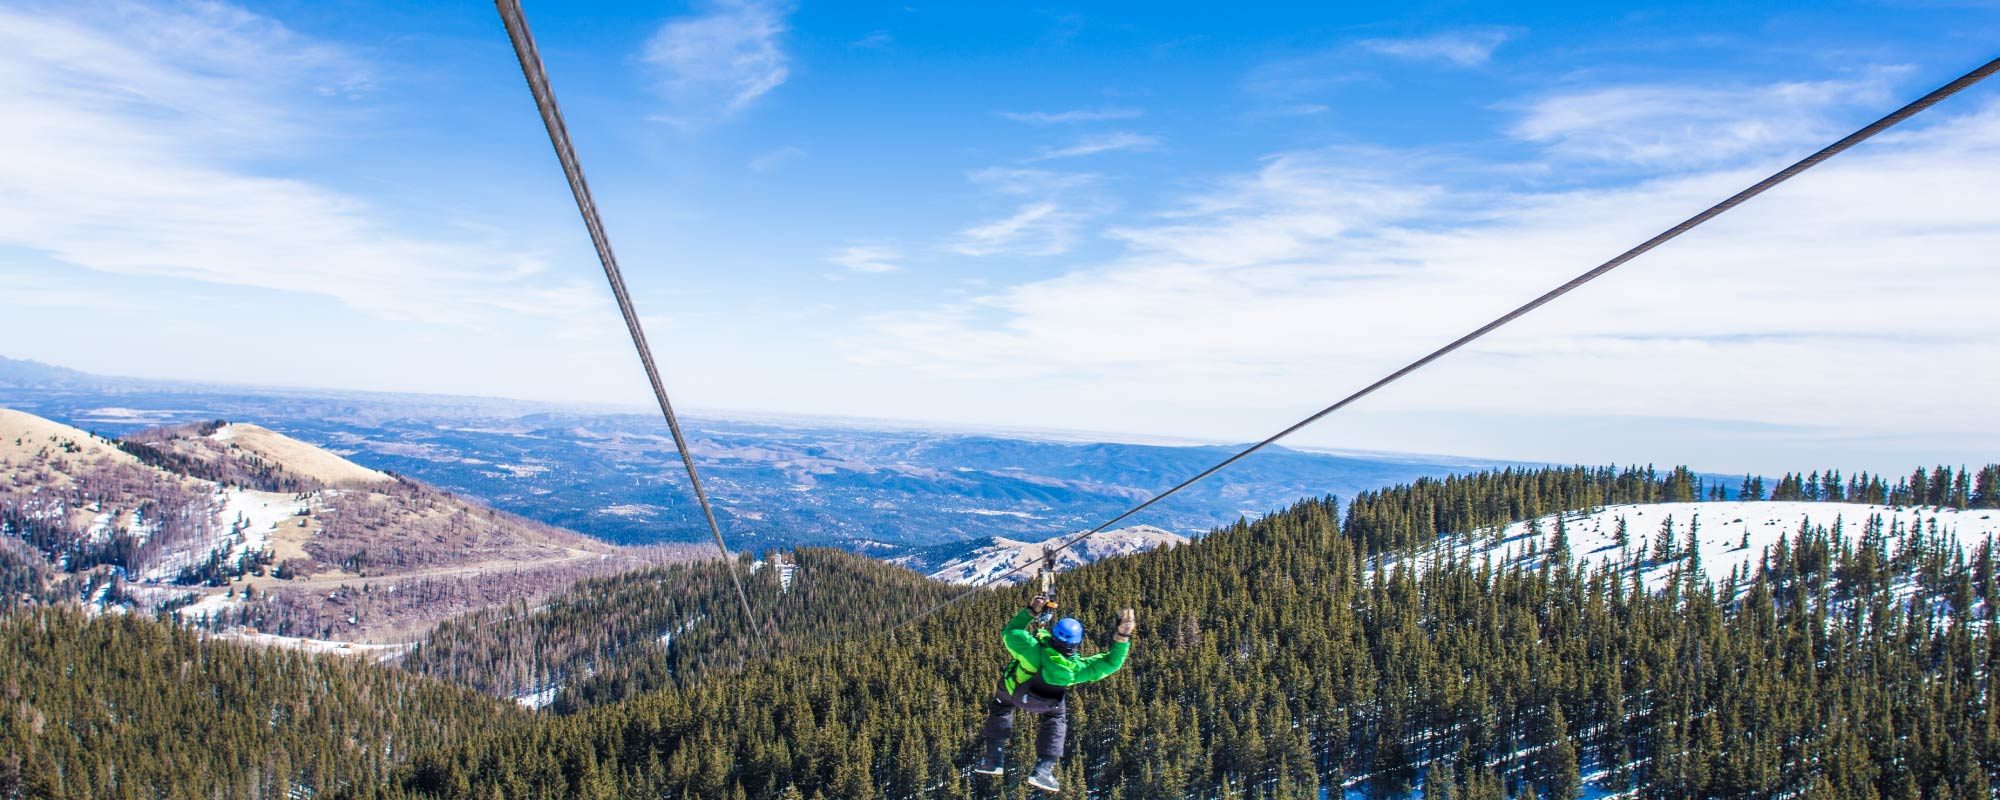 Zip Line at Ski Apache   Highest Zipline New Mexico Ski Apache Trail Map on